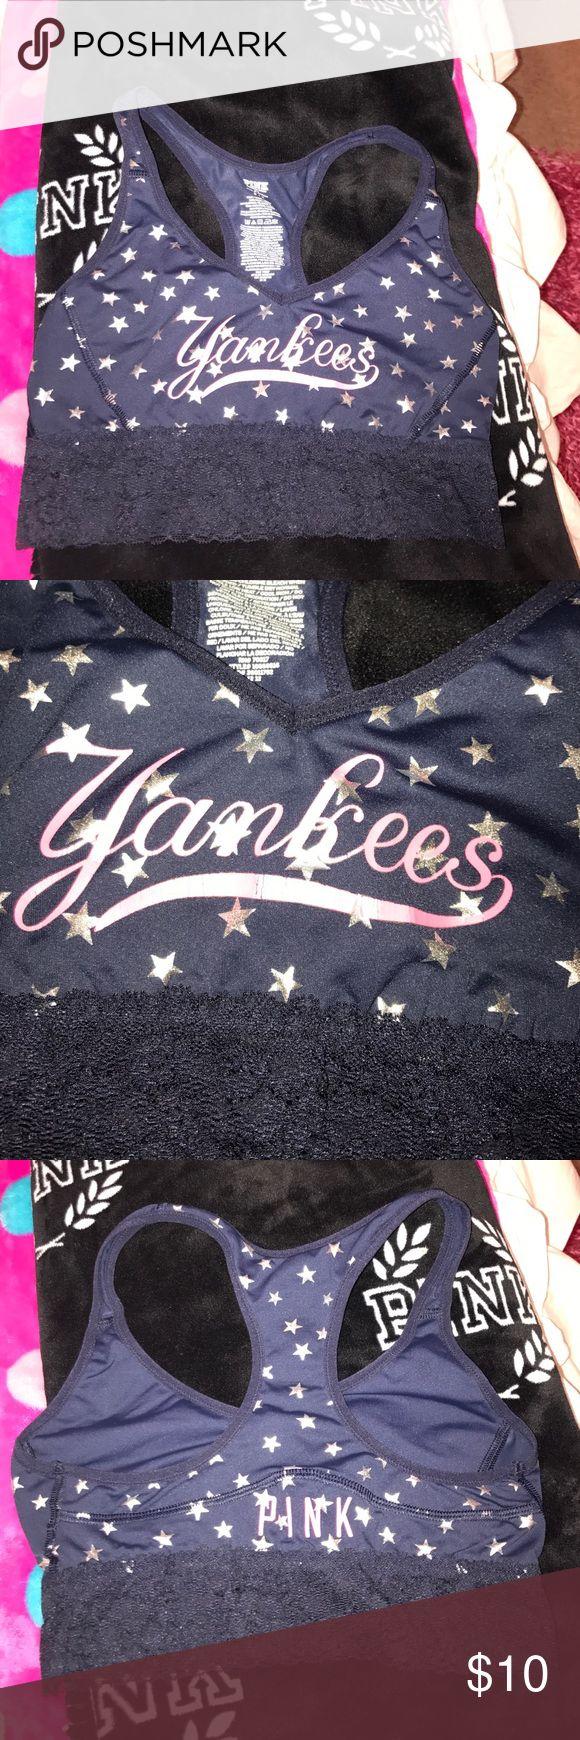 Pink Victoria's Secret sports bra Yankees baseball light support no padding PINK Victoria's Secret Intimates & Sleepwear Bras